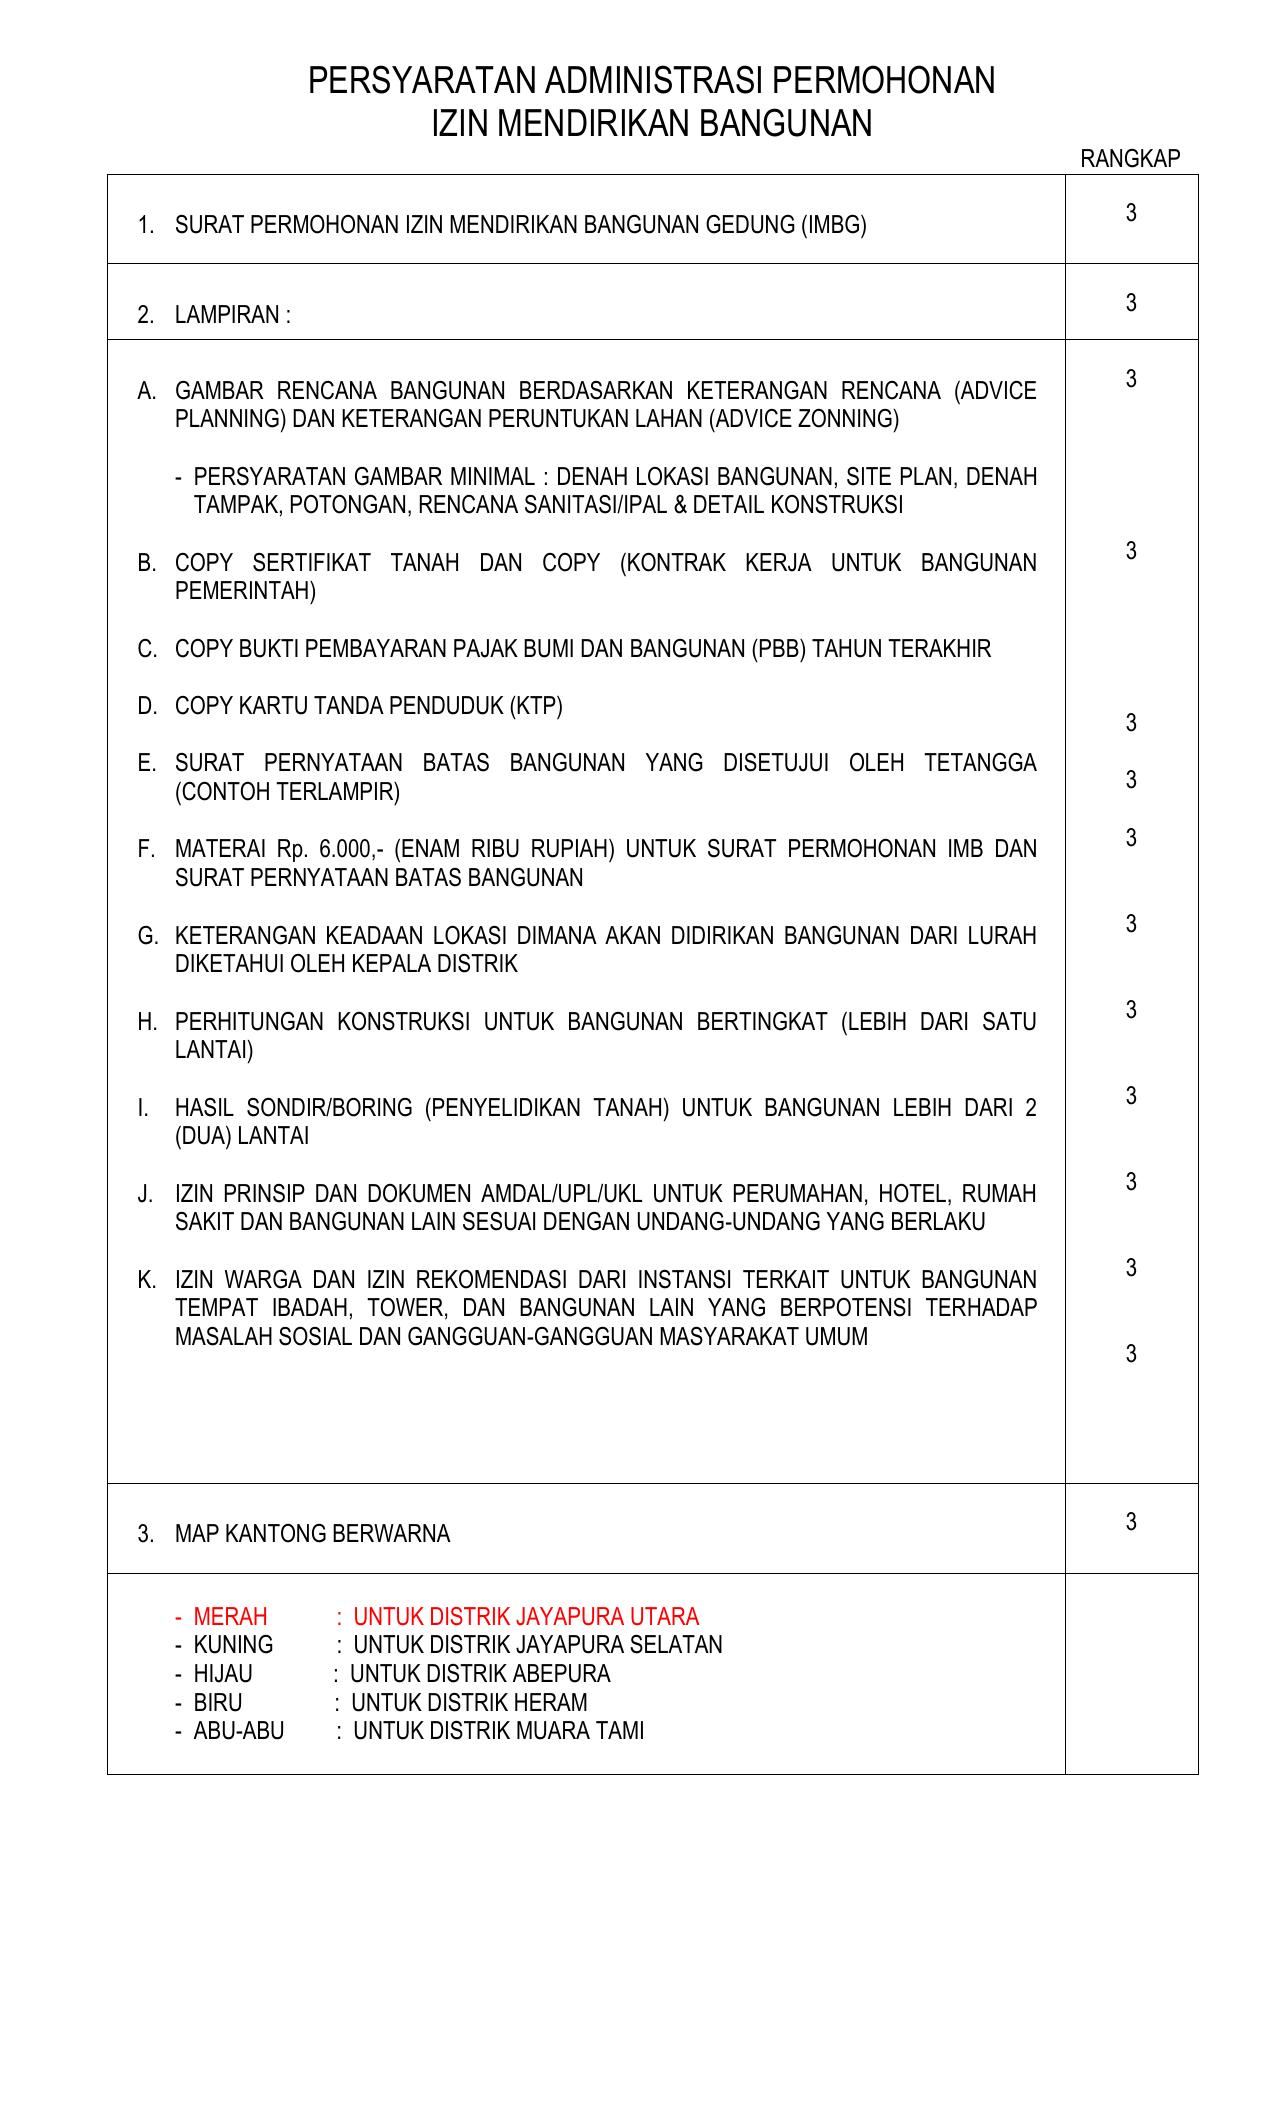 Surat Keterangan Pemerintah Kota Jayapura